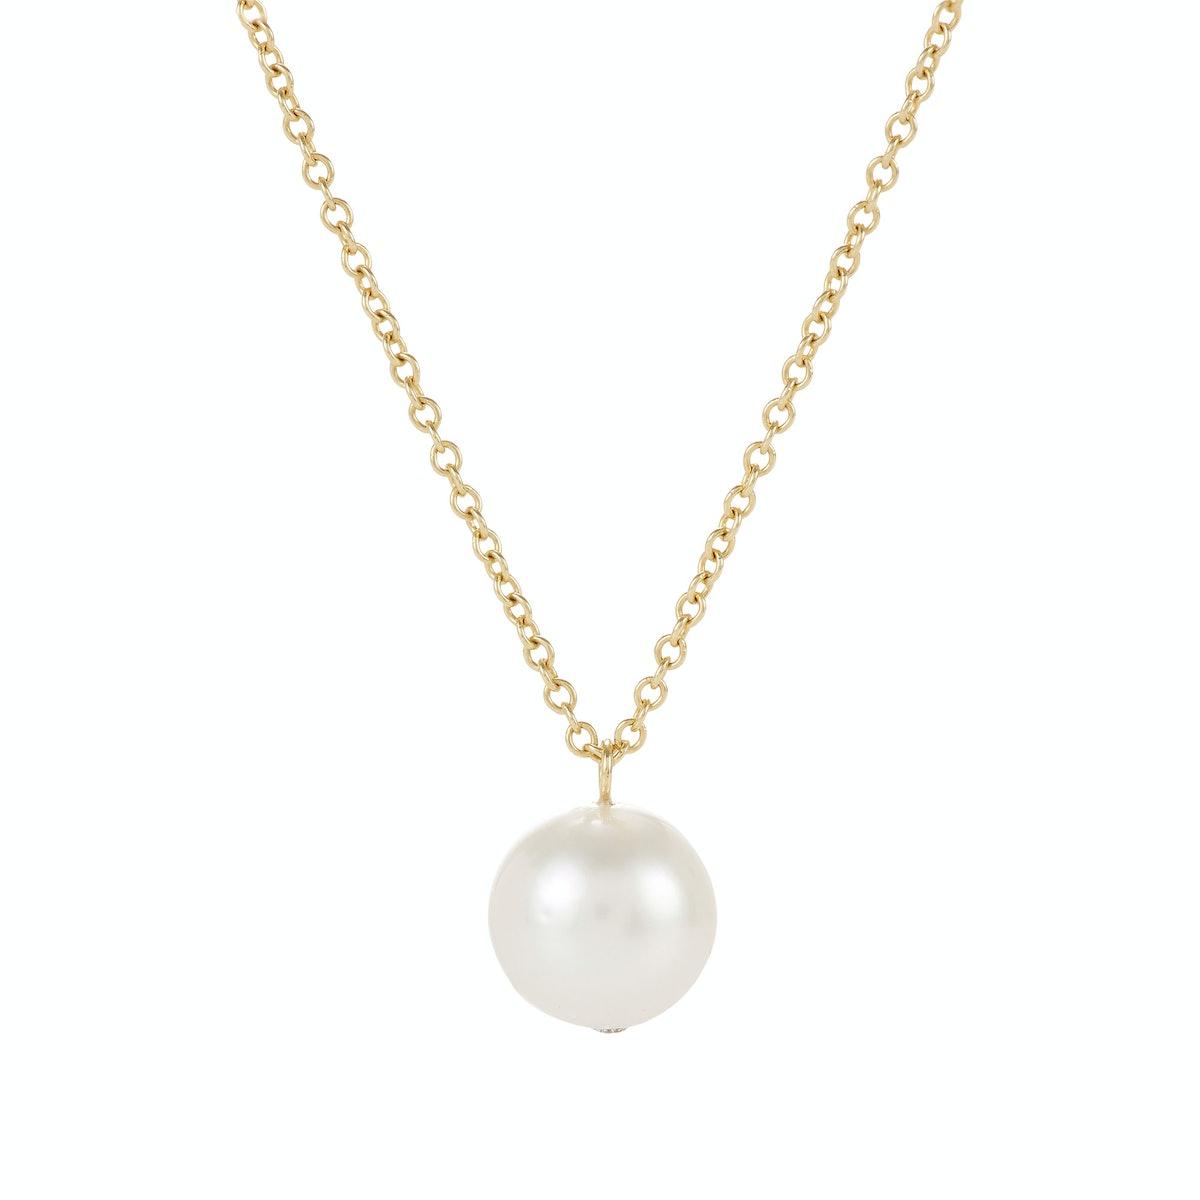 Finn pearl necklace